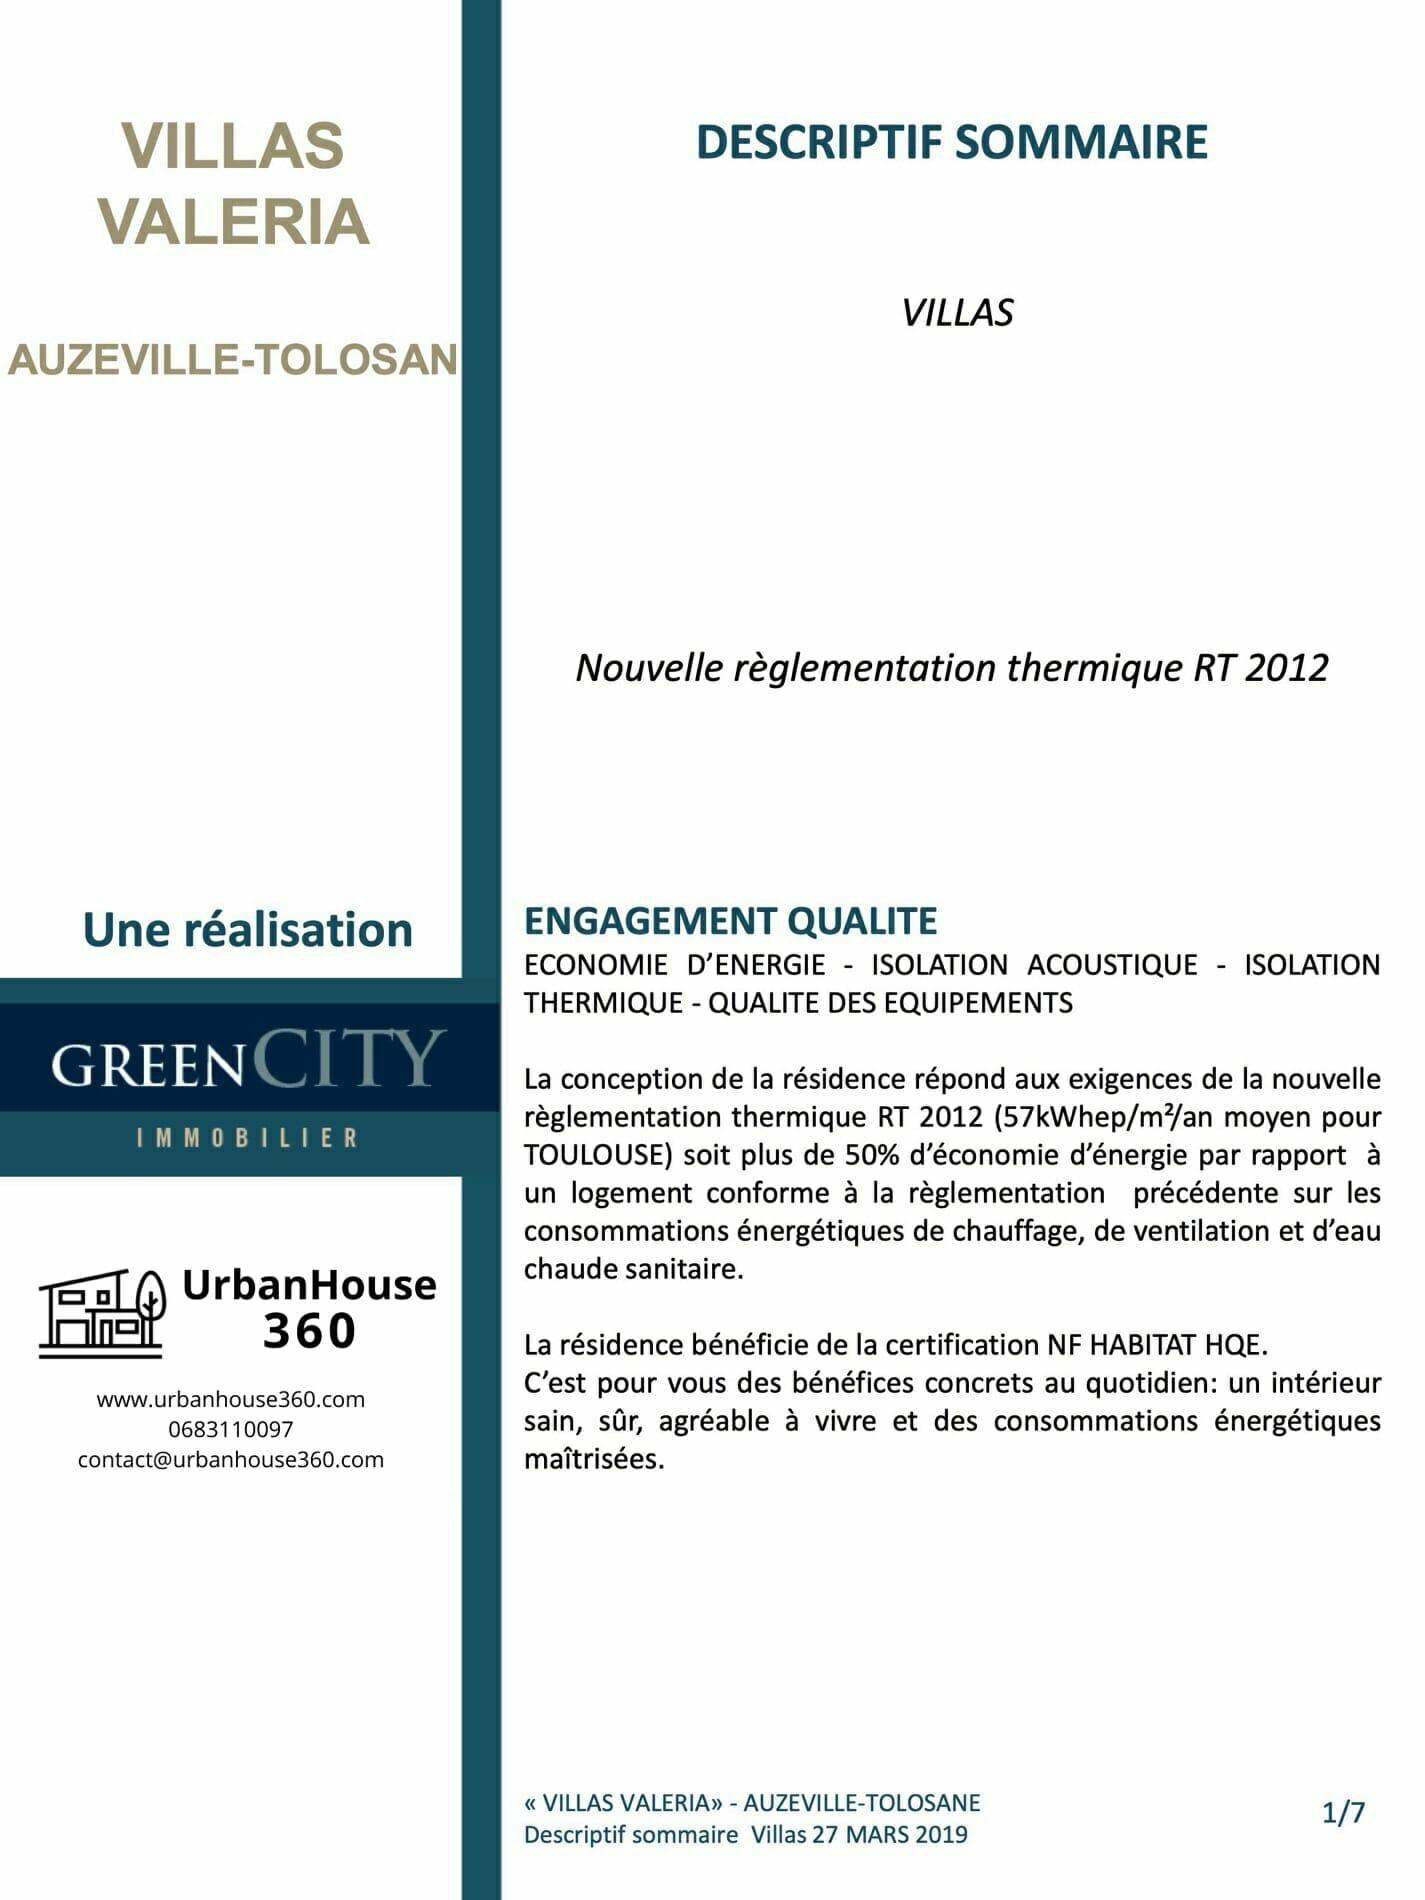 Urbanhouse360-descriptif_sommaire_villas_valeria